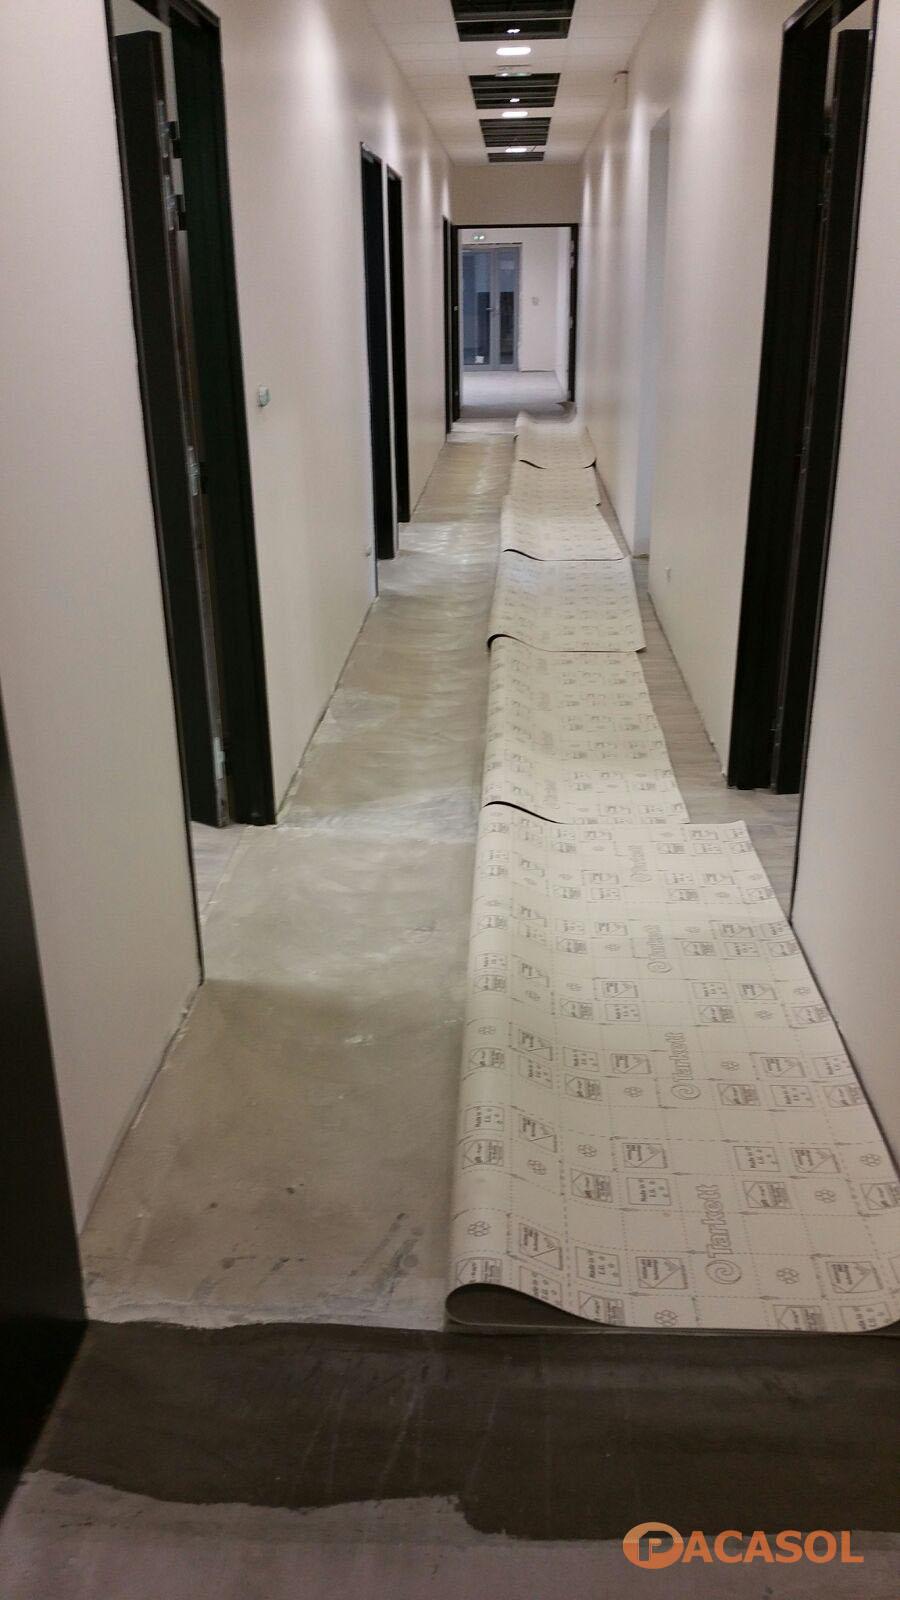 Revêtement de sol Tapiflex Excellence 4 Tarkett Lycée Jean Perrin Marseille - Pacasol